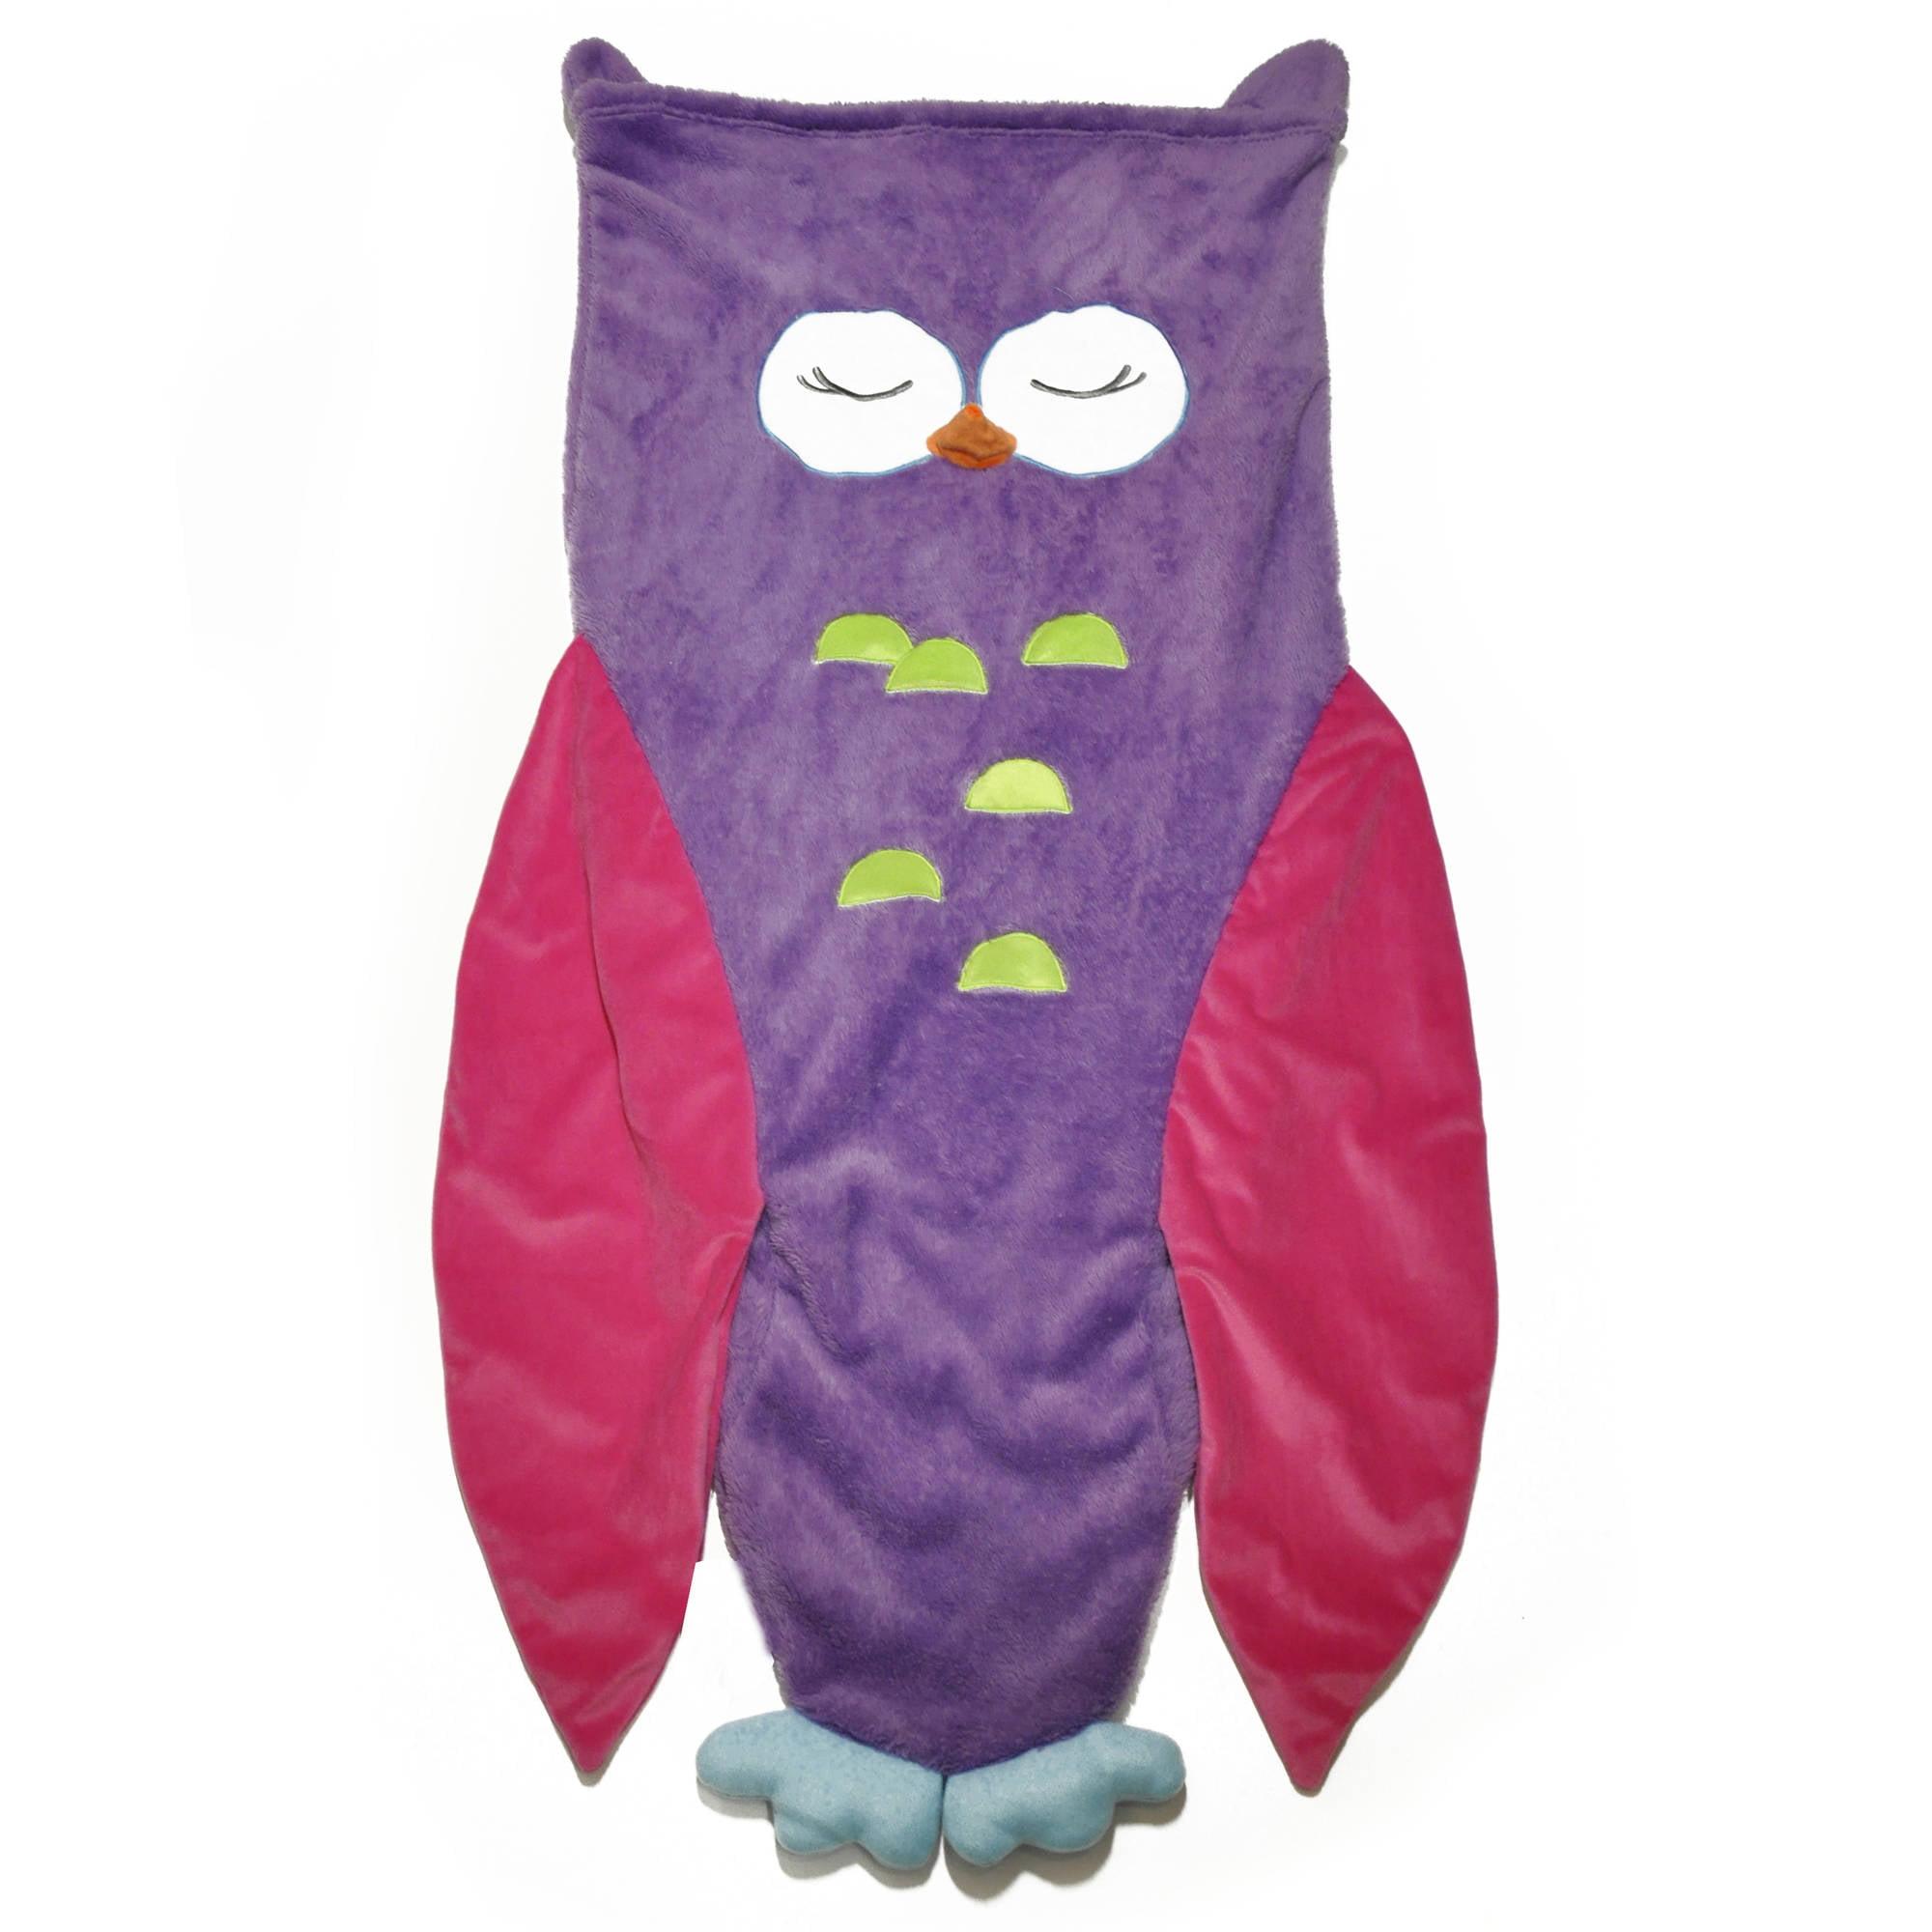 American Kids Owl Tail Blanket Walmart Com